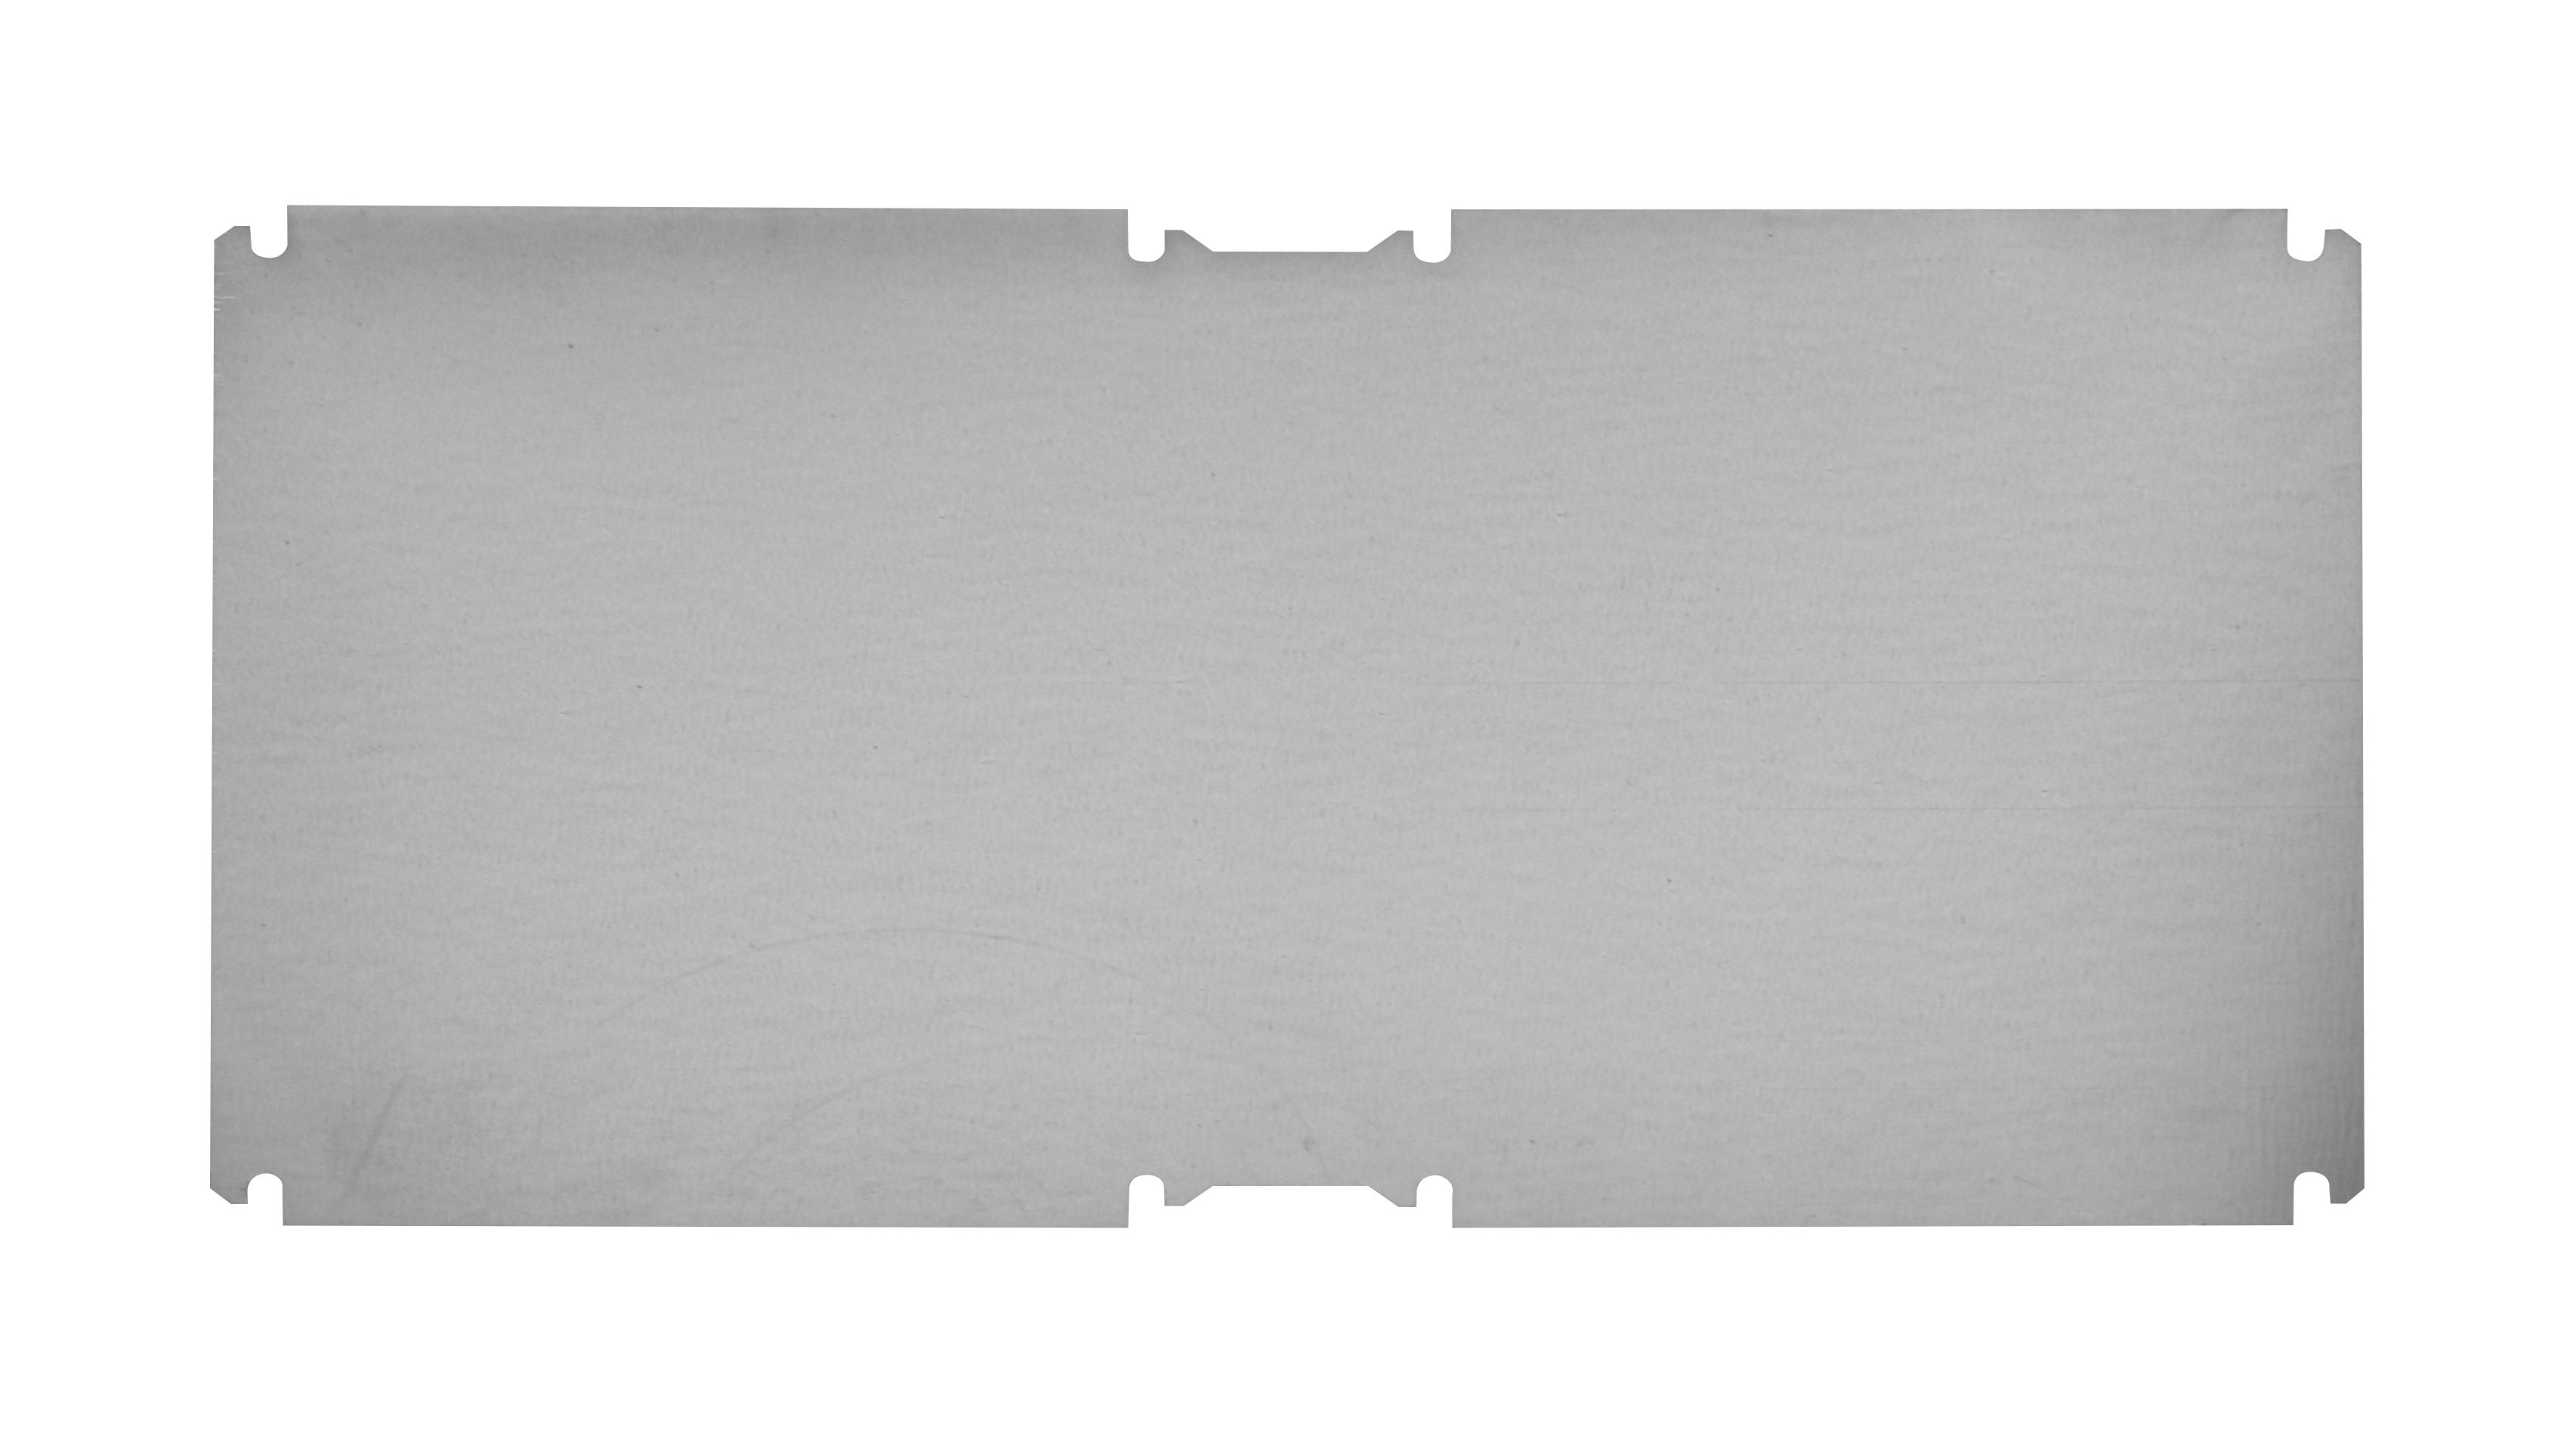 1 Stk Montageplatte PG - 518x338 IG711202--